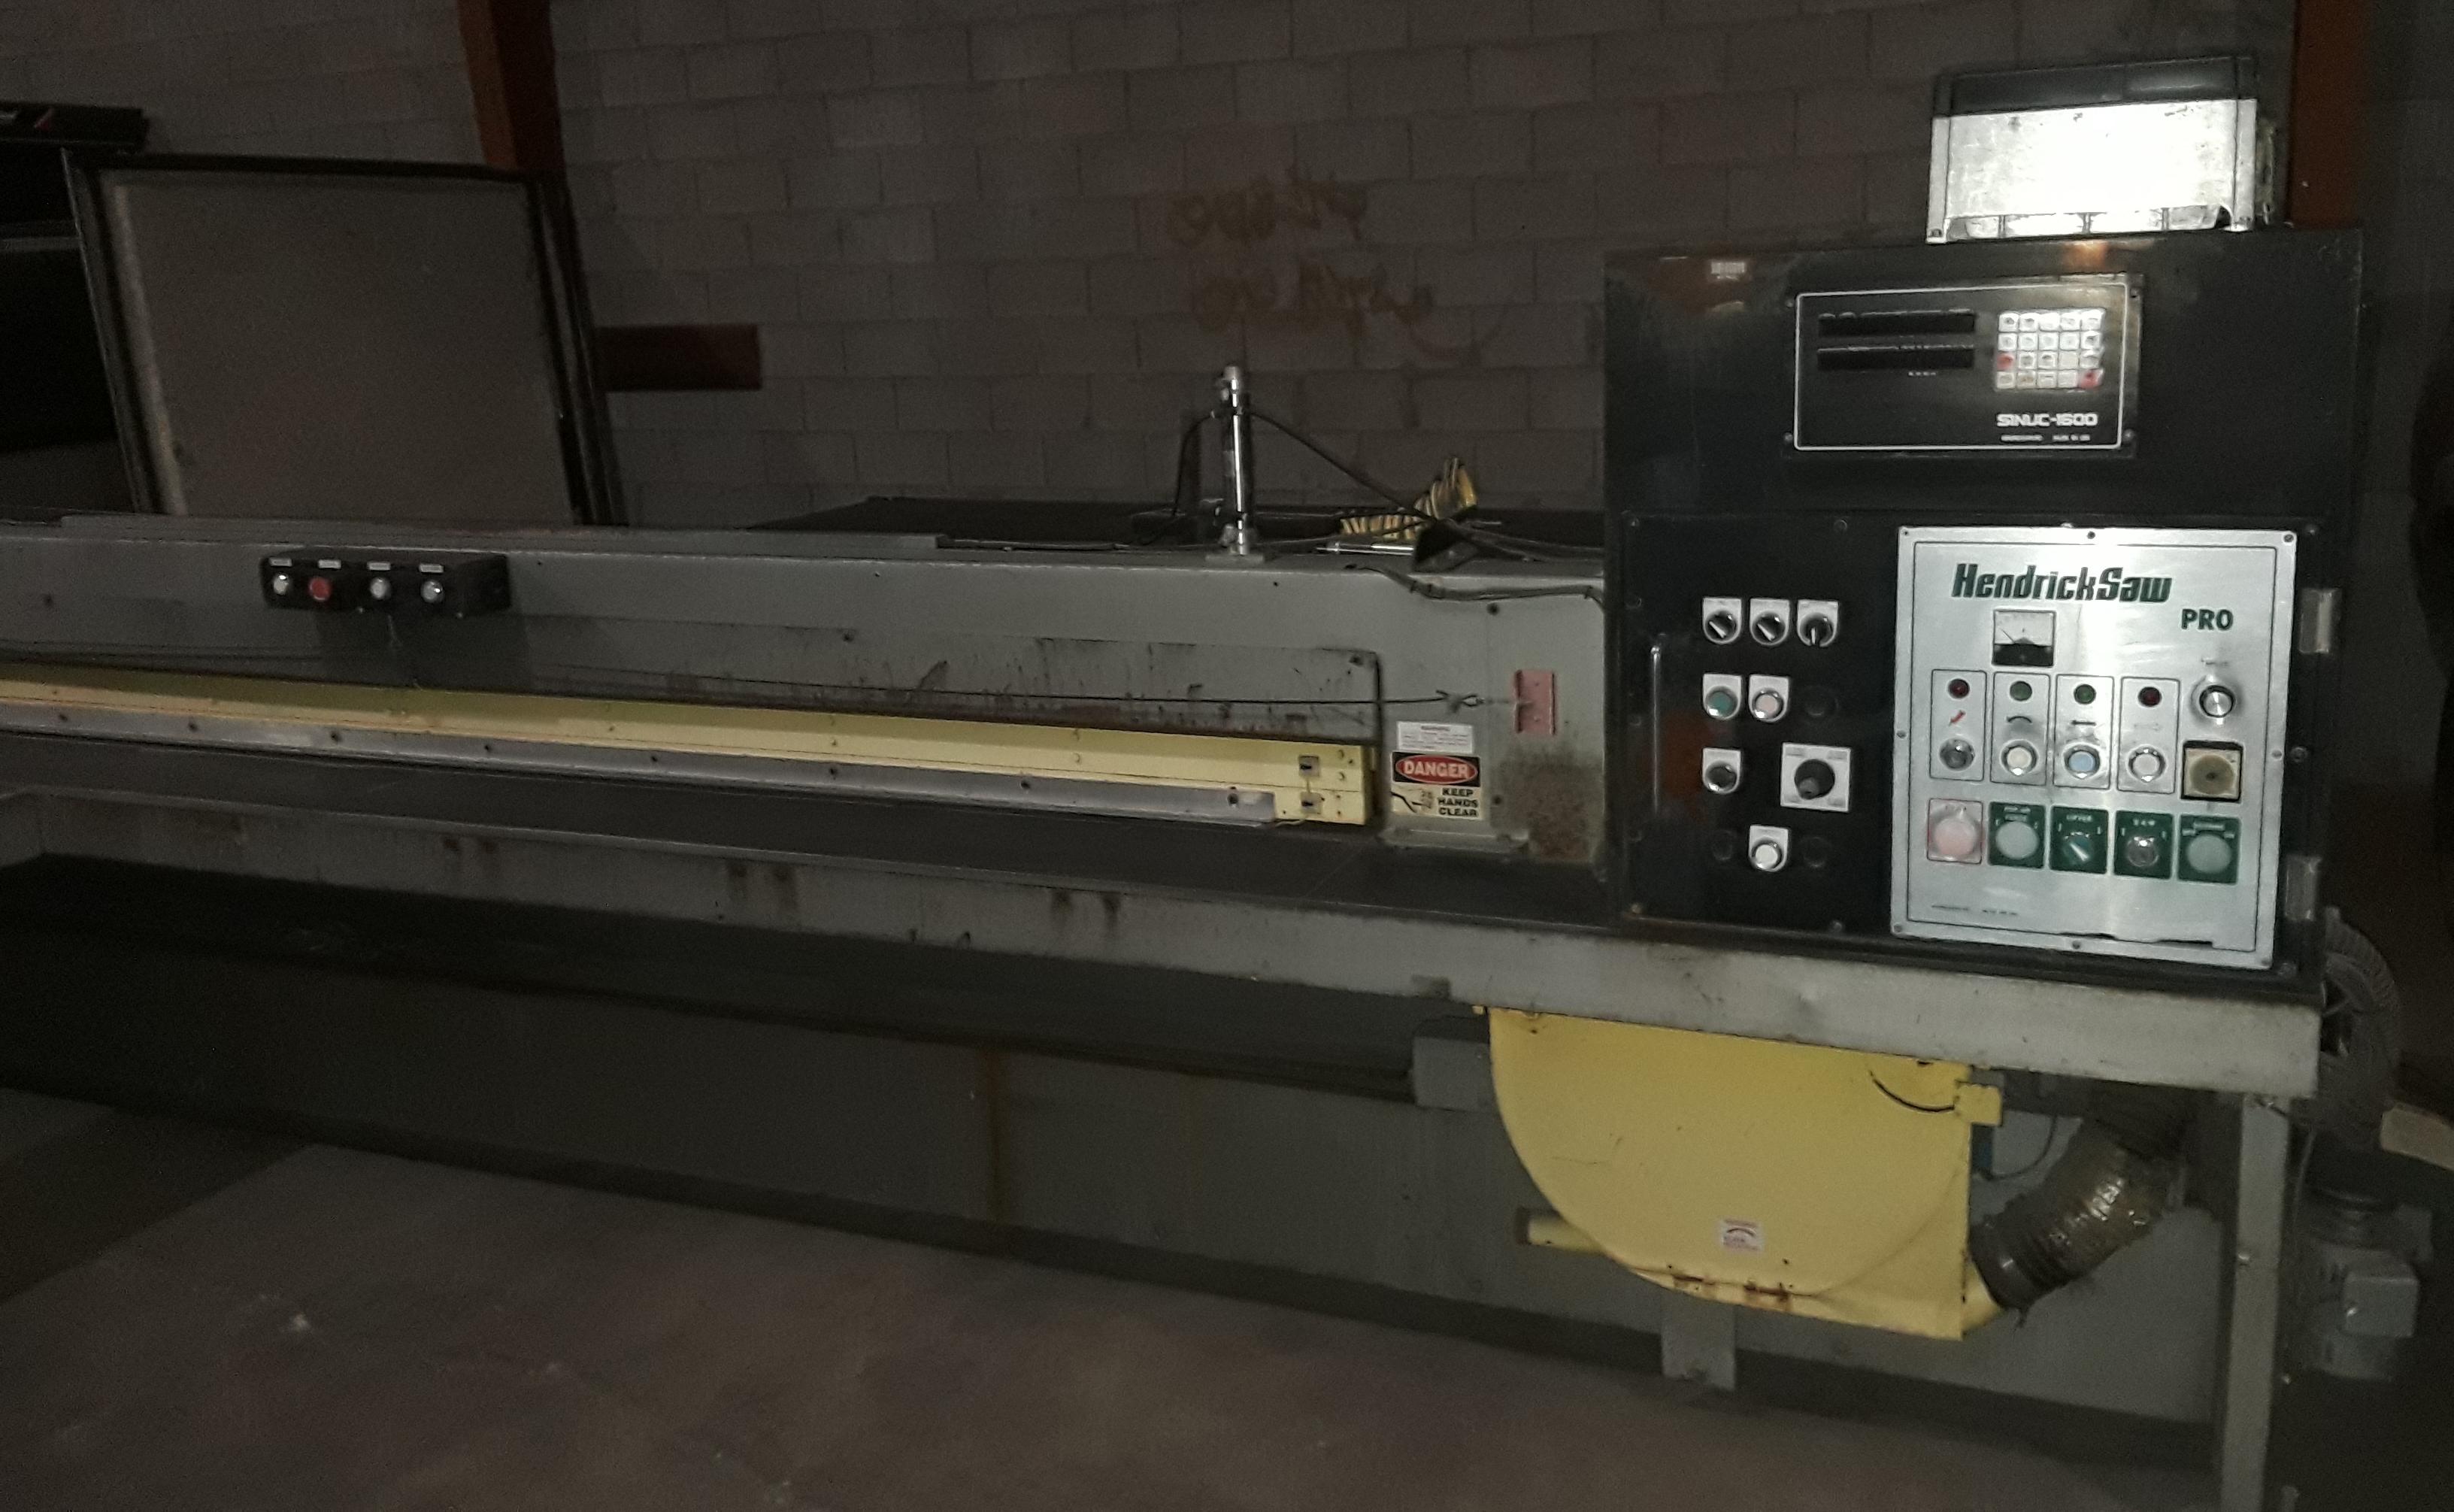 Hendrick Front Load Panel Saw, Pro H 126 220 volt 3 phase